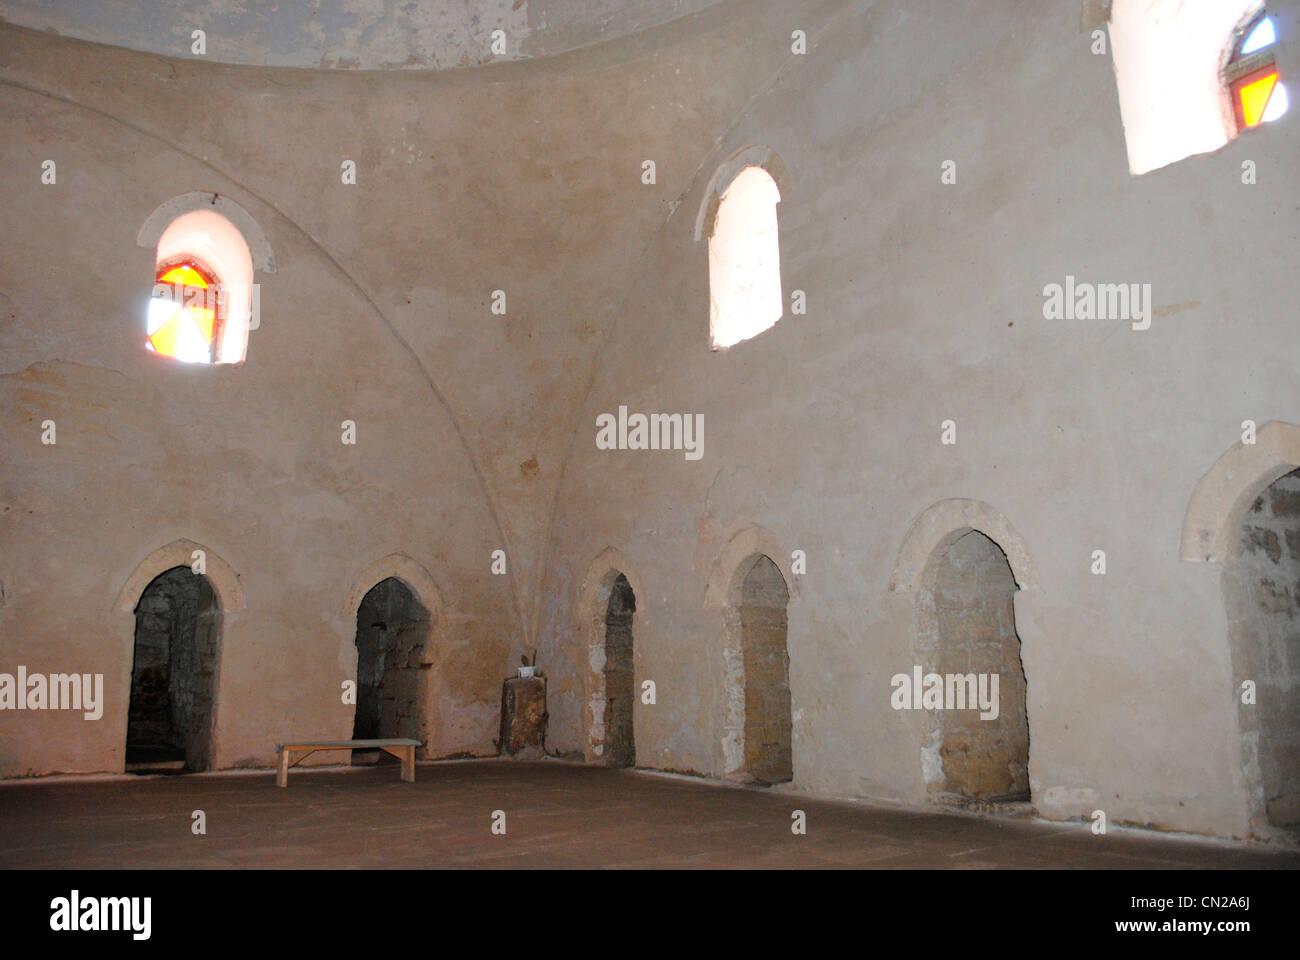 Ukraine. Autonomous Republic of Crimea. Yevpatoria. Dervish Tekke monastery. 15th century. Interior. - Stock Image